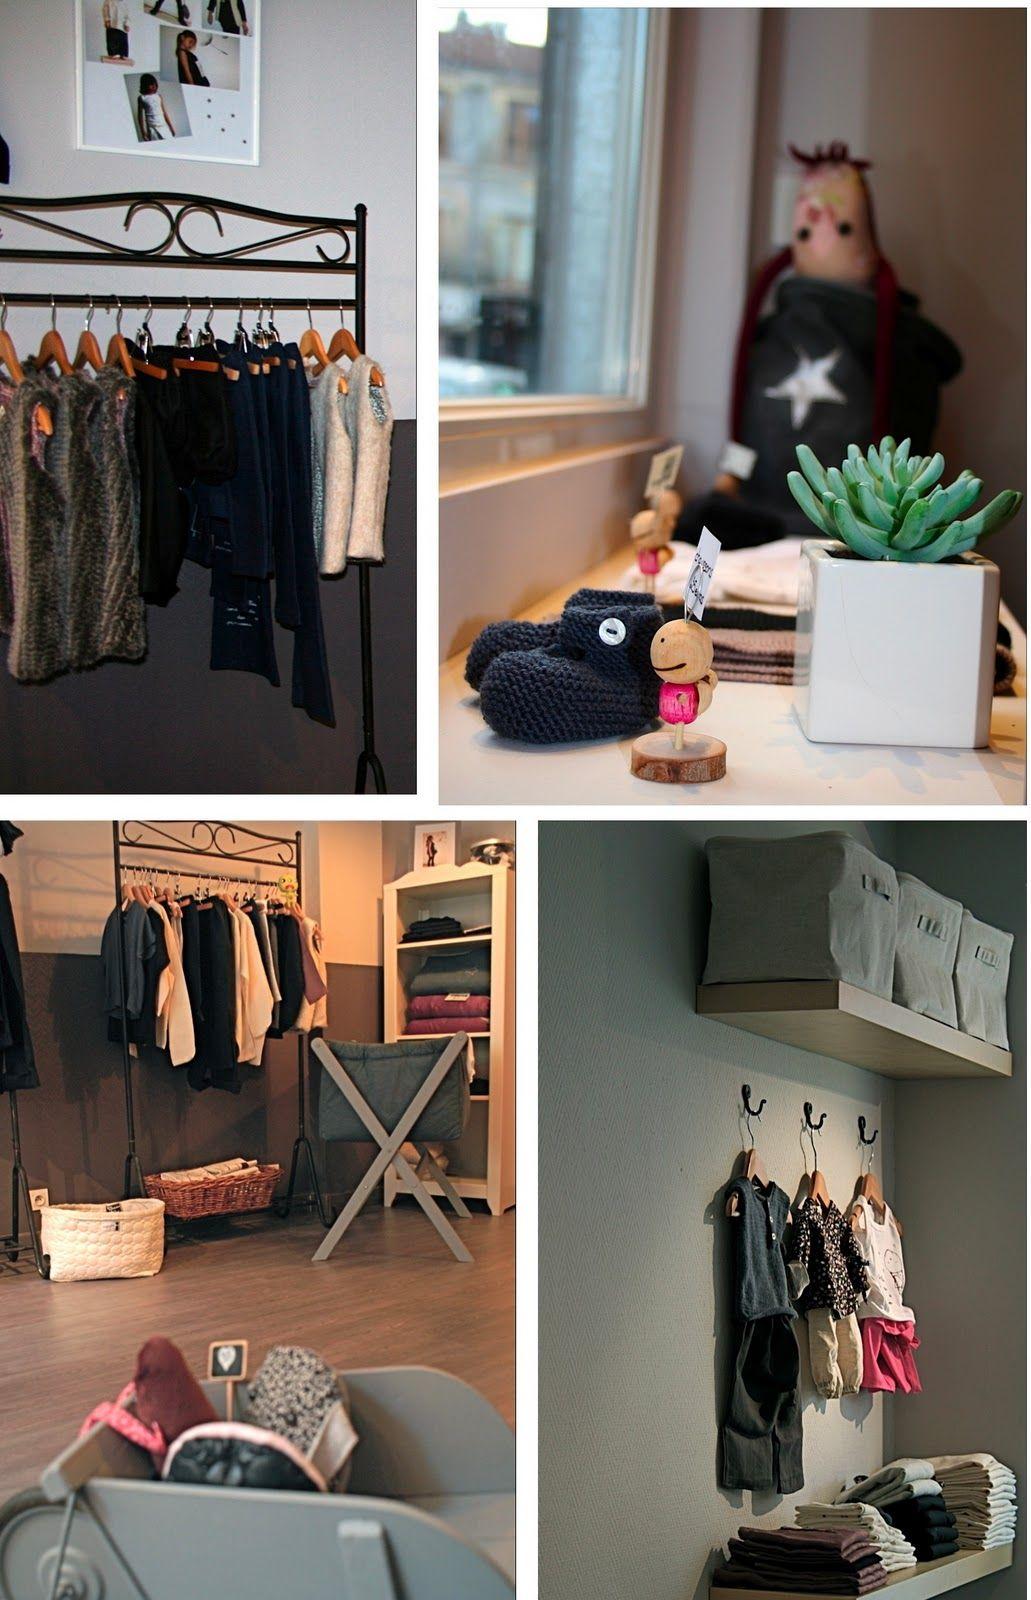 L Atelier 50 lili grenadine: l'atelier - boutique50 rue samson 75013